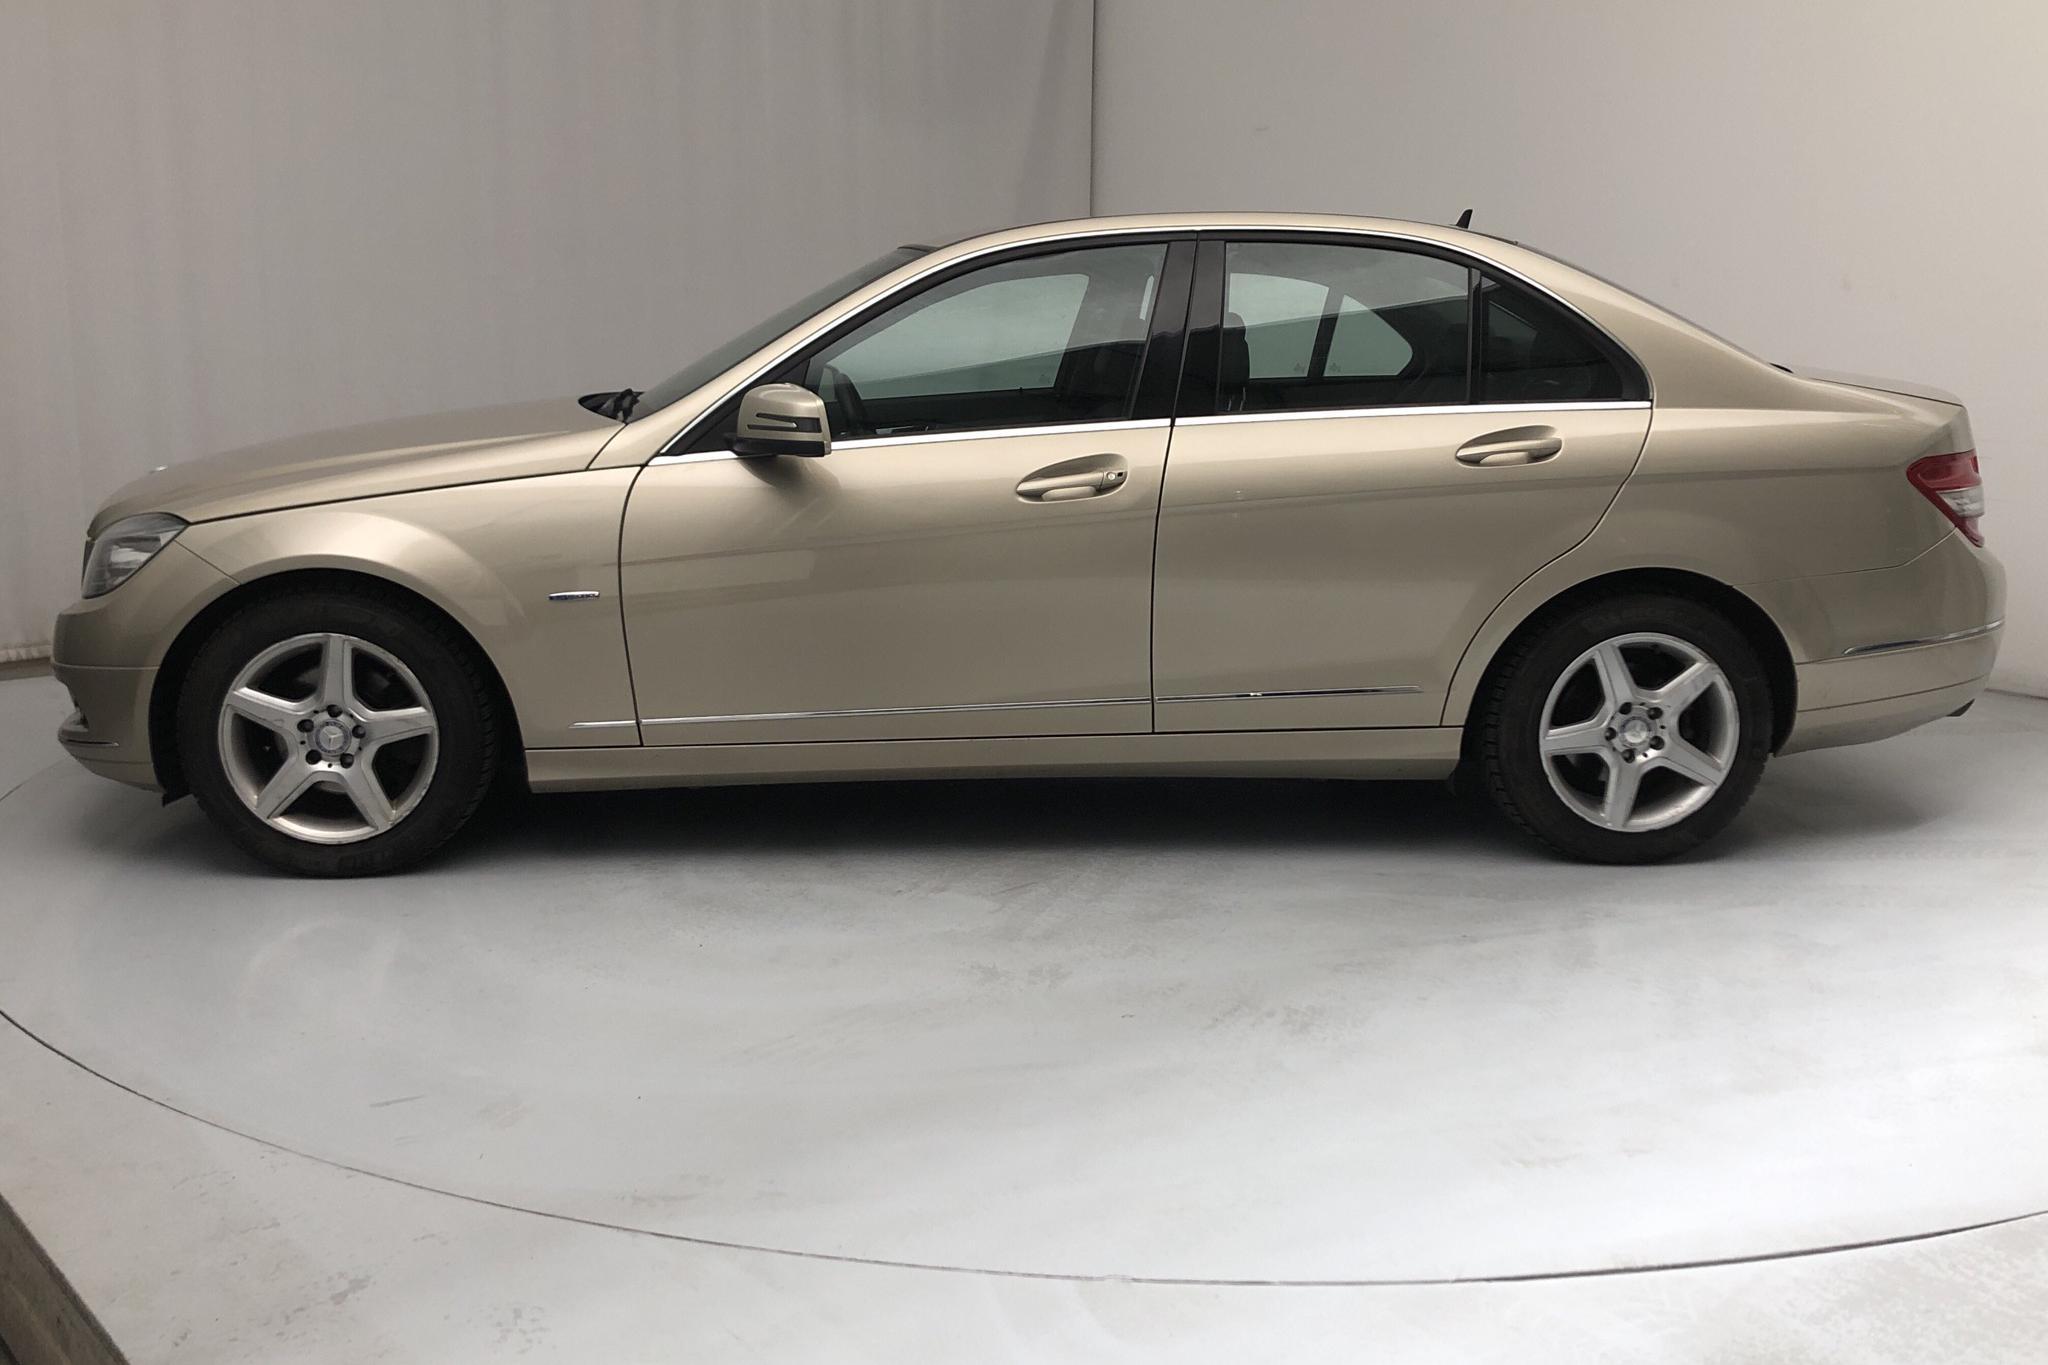 Mercedes C 180 CGI BlueEfficiency W204 (156hk) - 198 210 km - Automatic - Light Brown - 2010